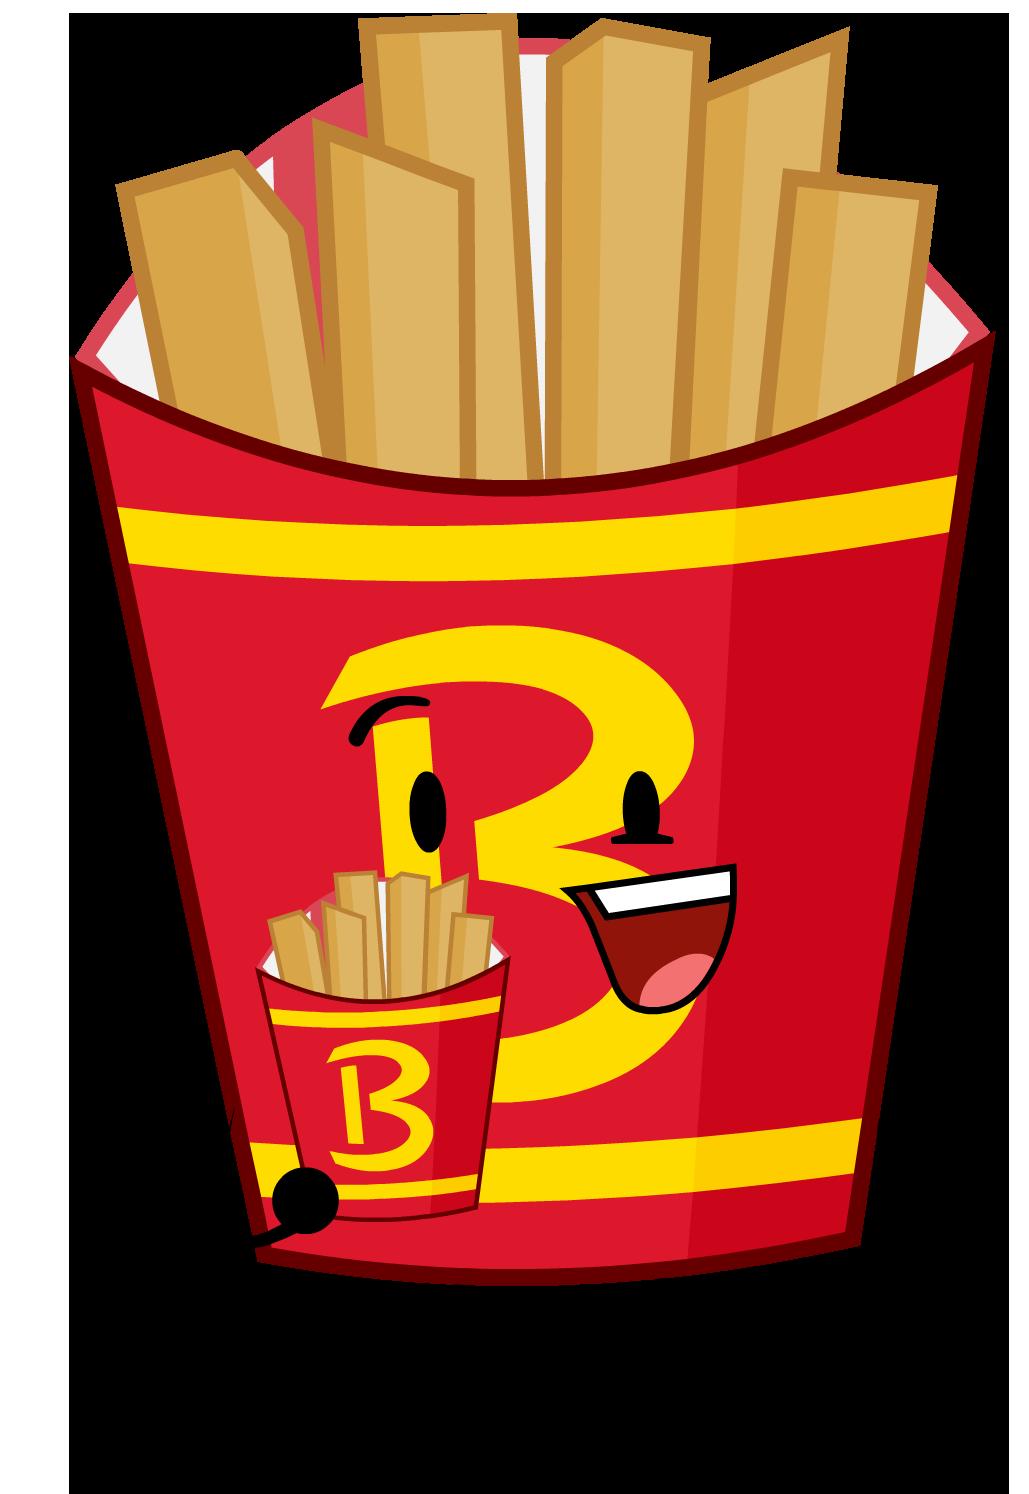 Fries (BFSP)